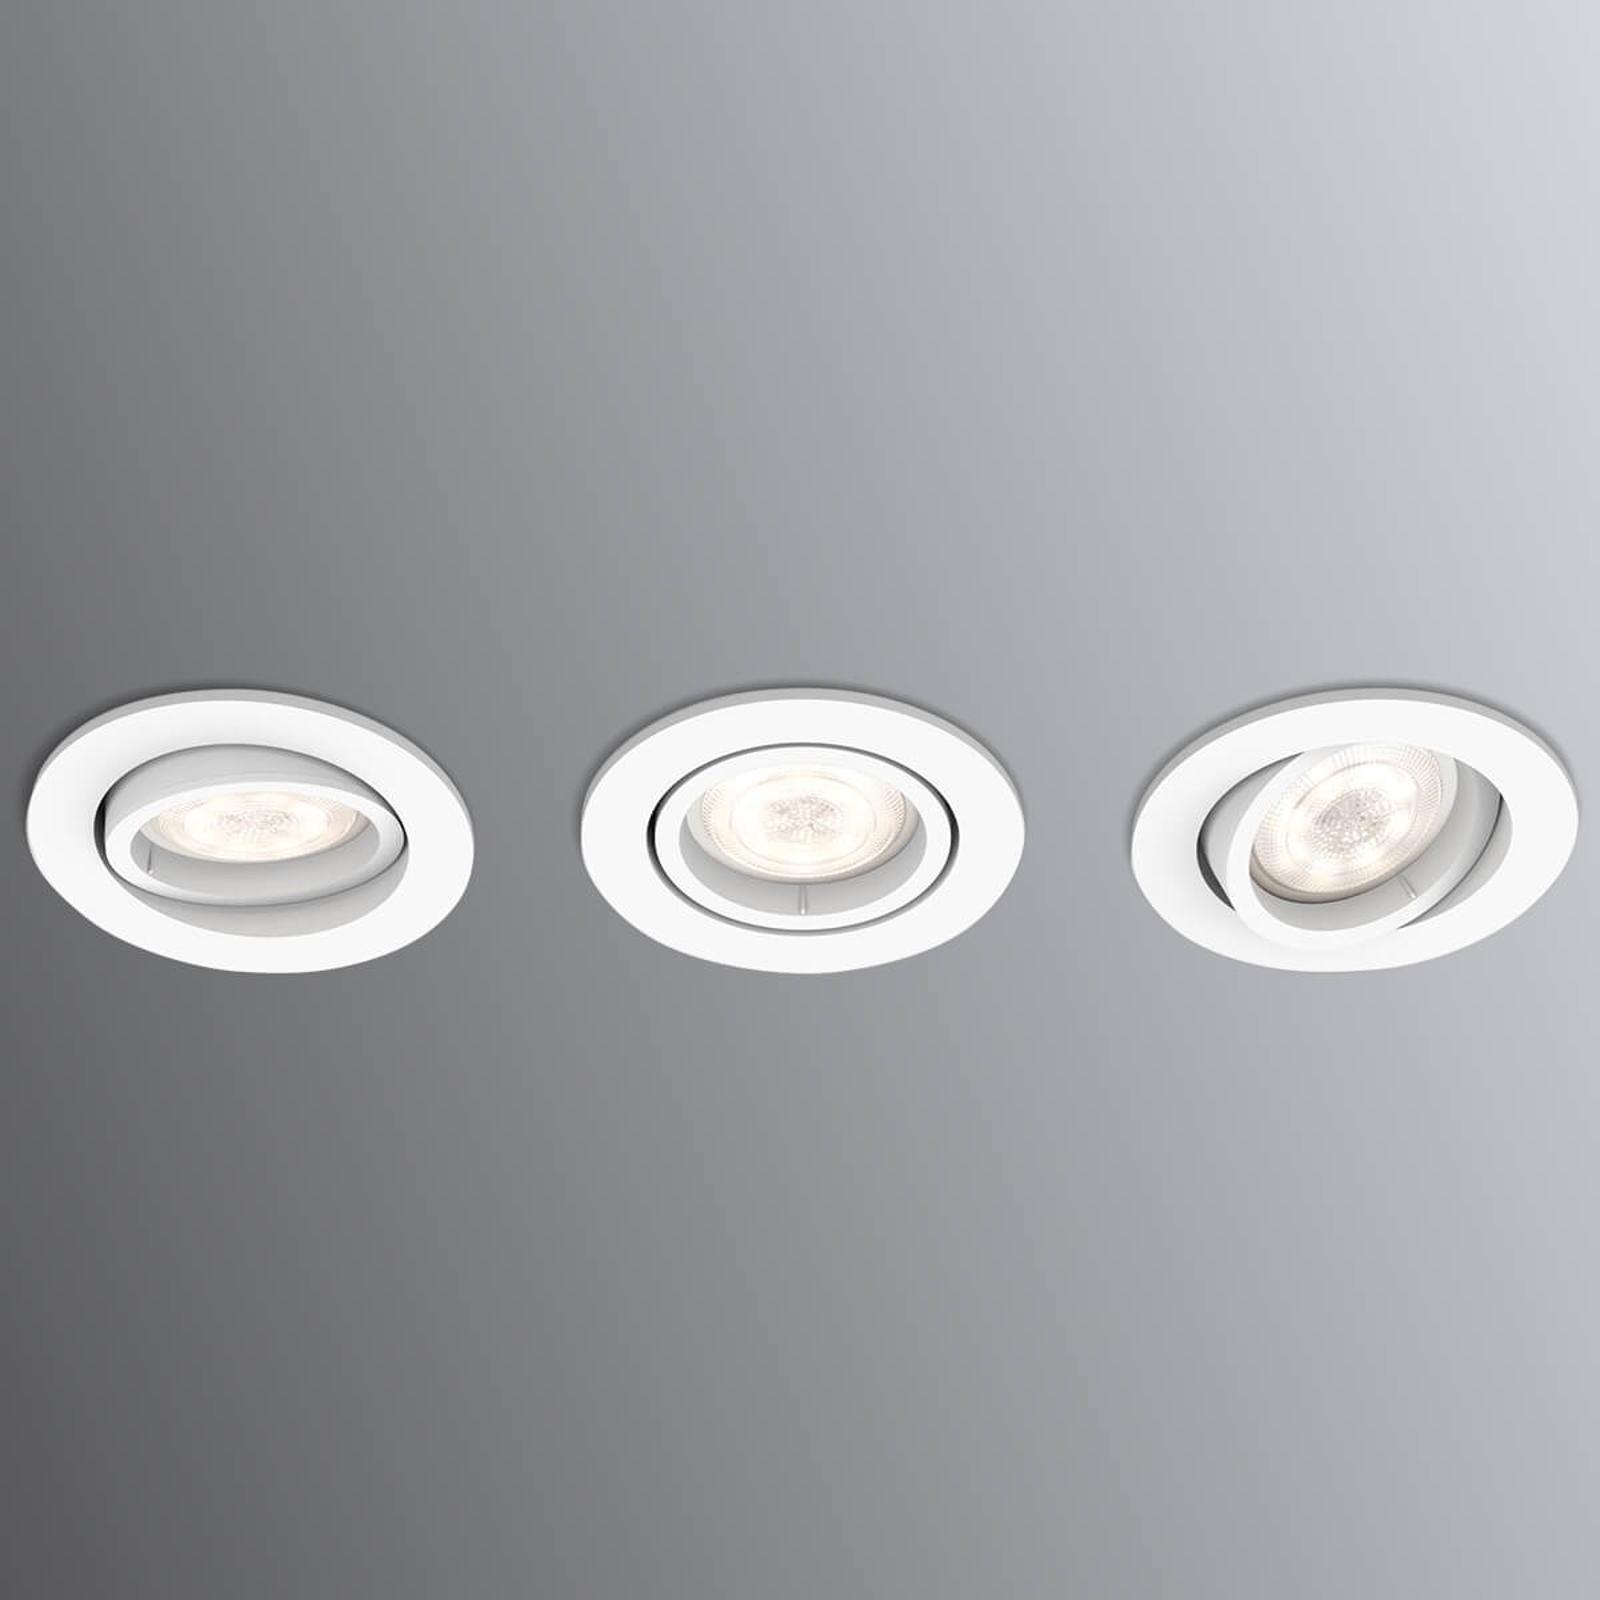 Dimbare LED inbouwspot Shellbark WarmGlow 3 stuks